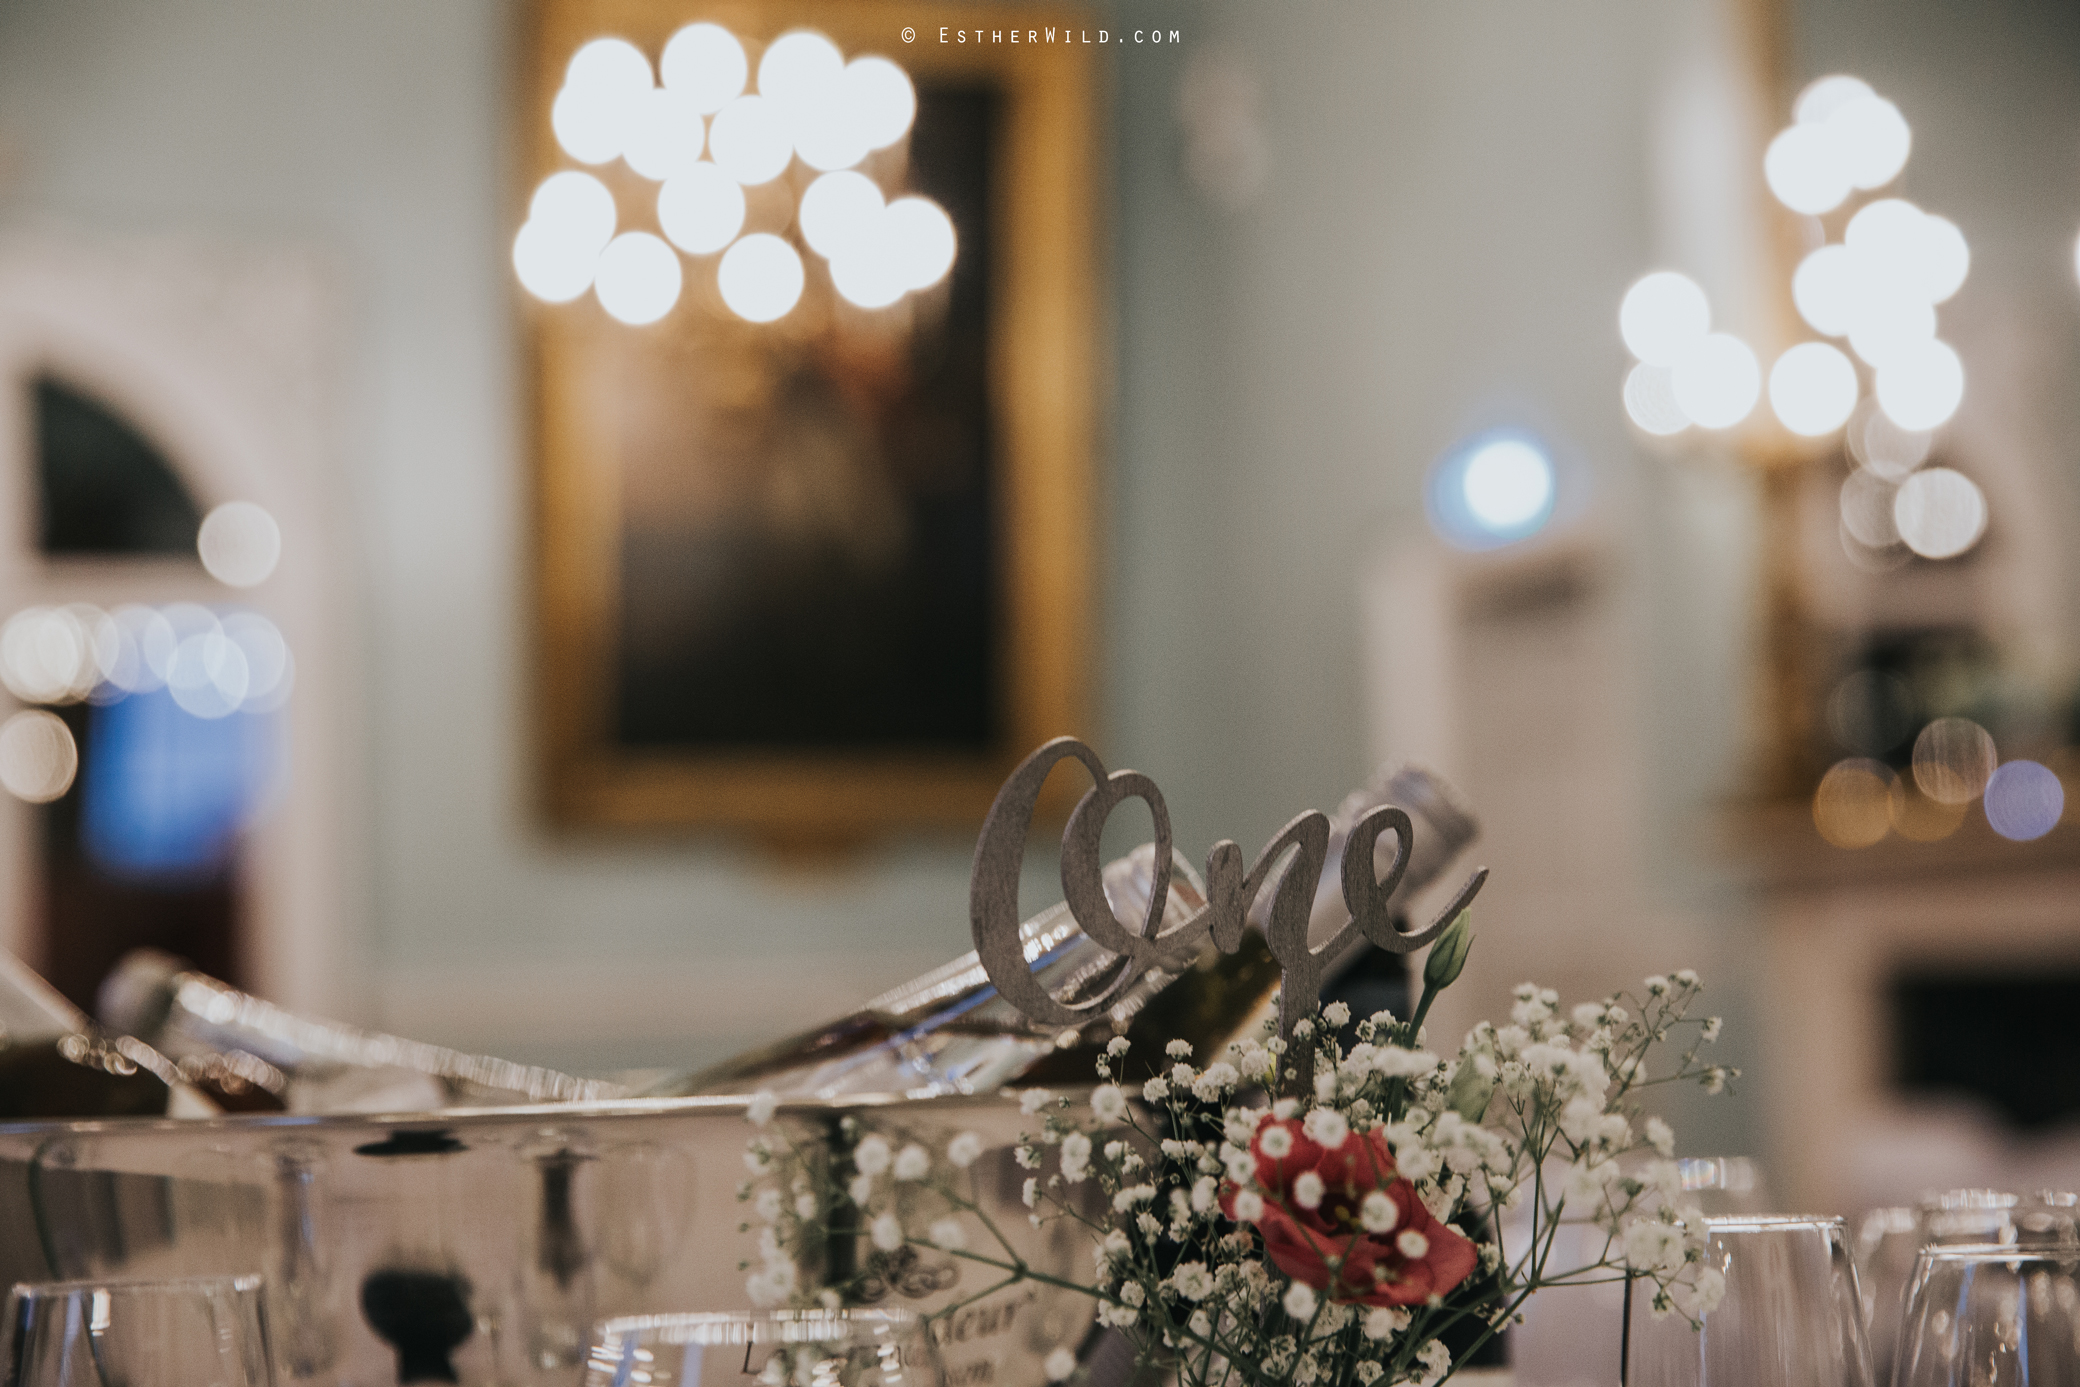 Wedding_Kings_Lynn_Town_Hall_Norfolk_Photographer_Esther_Wild_IMG_1438.jpg